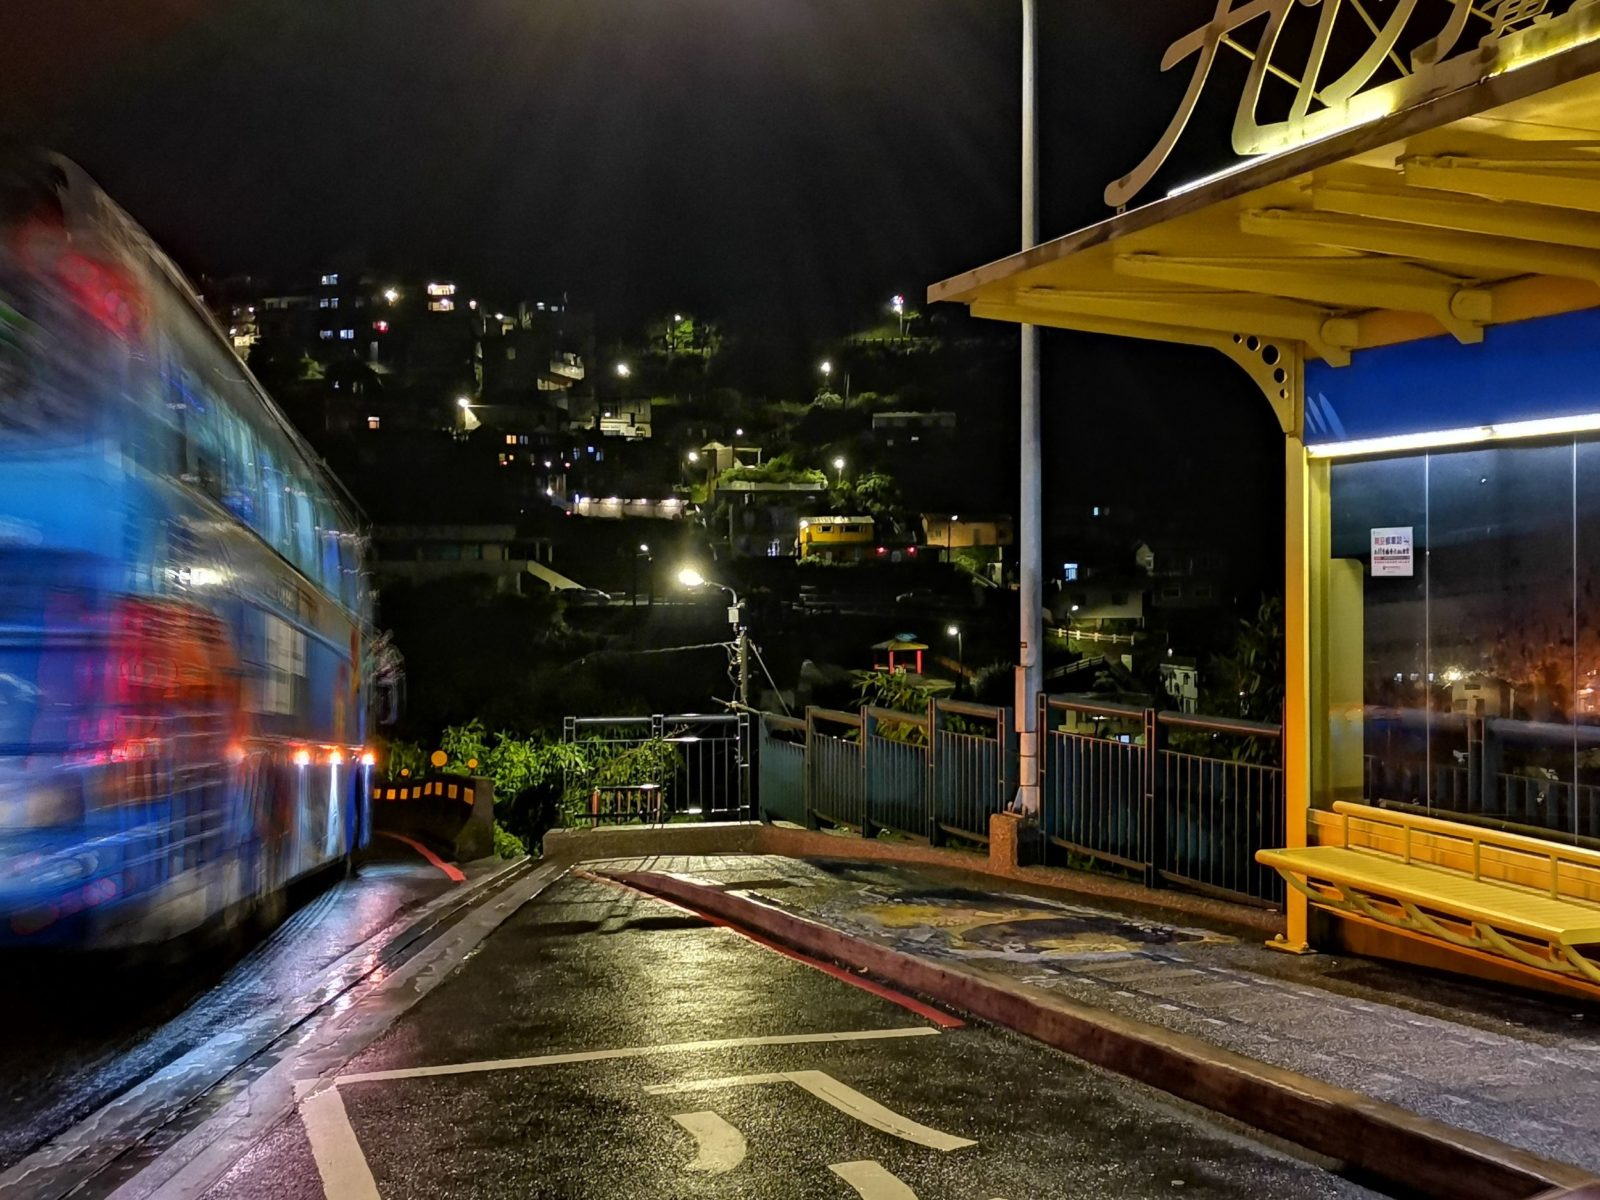 DETIENNE Nelly - Night bus